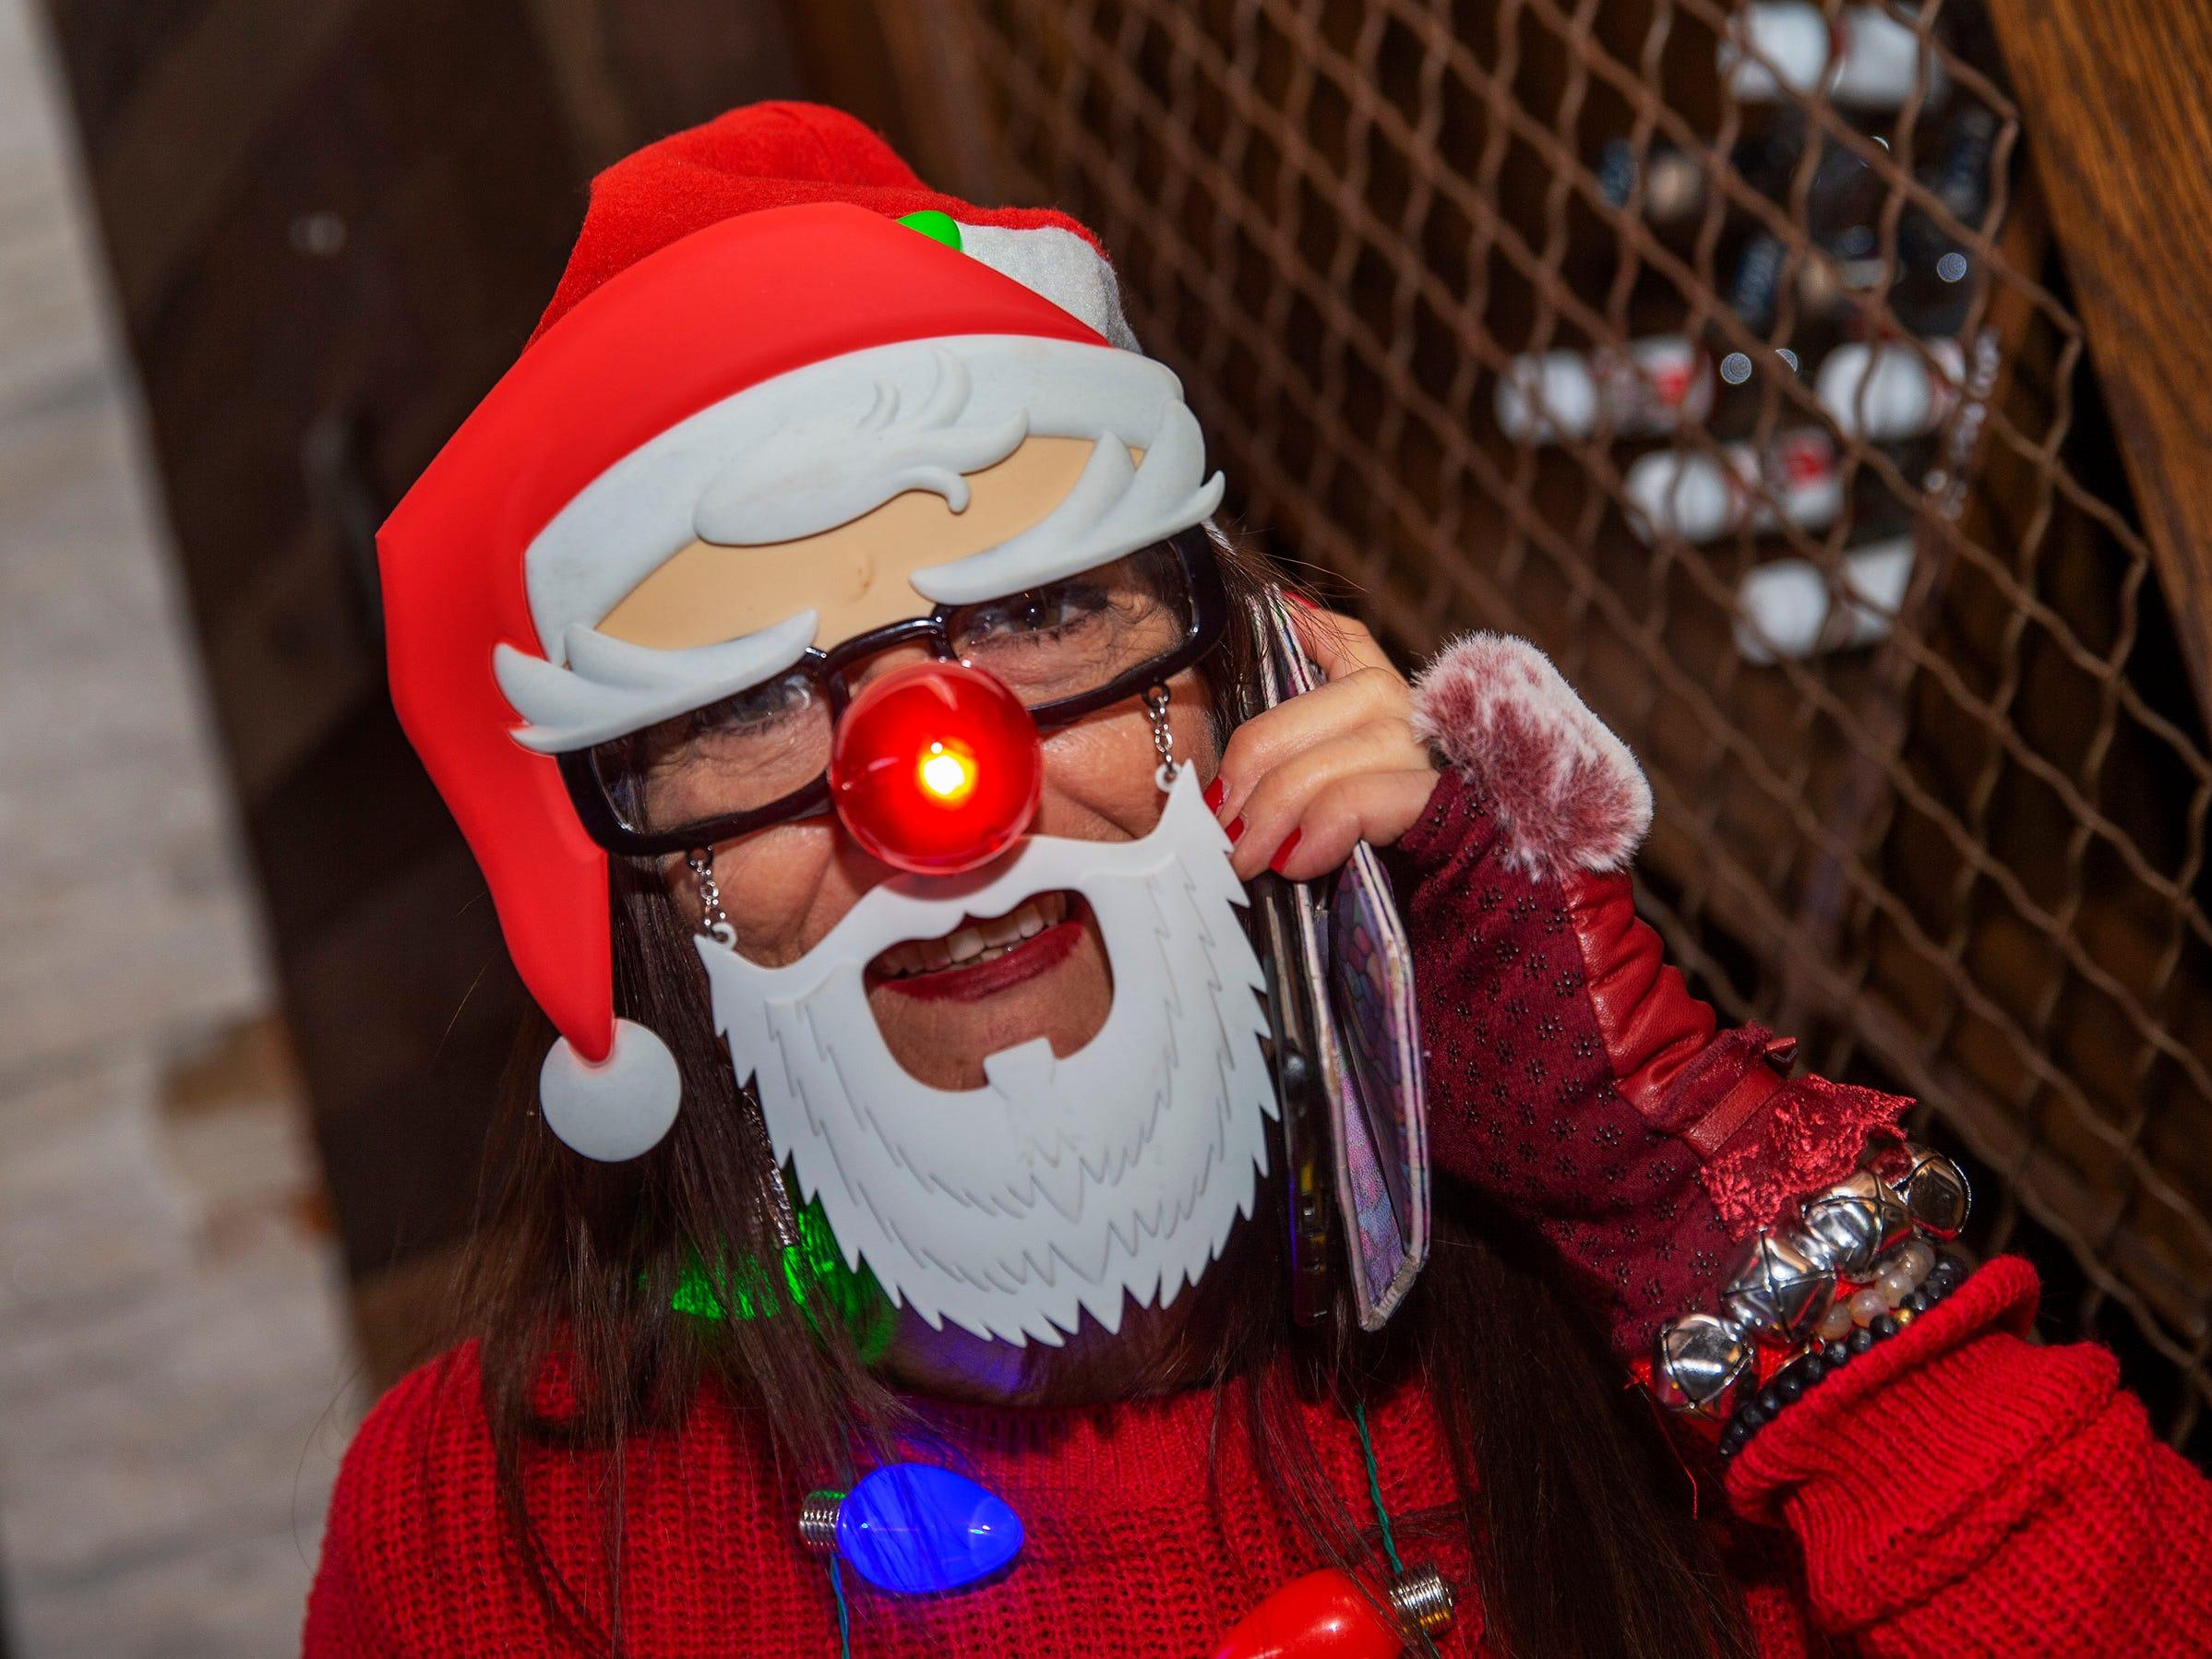 Lucille Berardi of Linden dressed up for SantaCon Bar Crawl through Asbury Park on December 8, 2018.